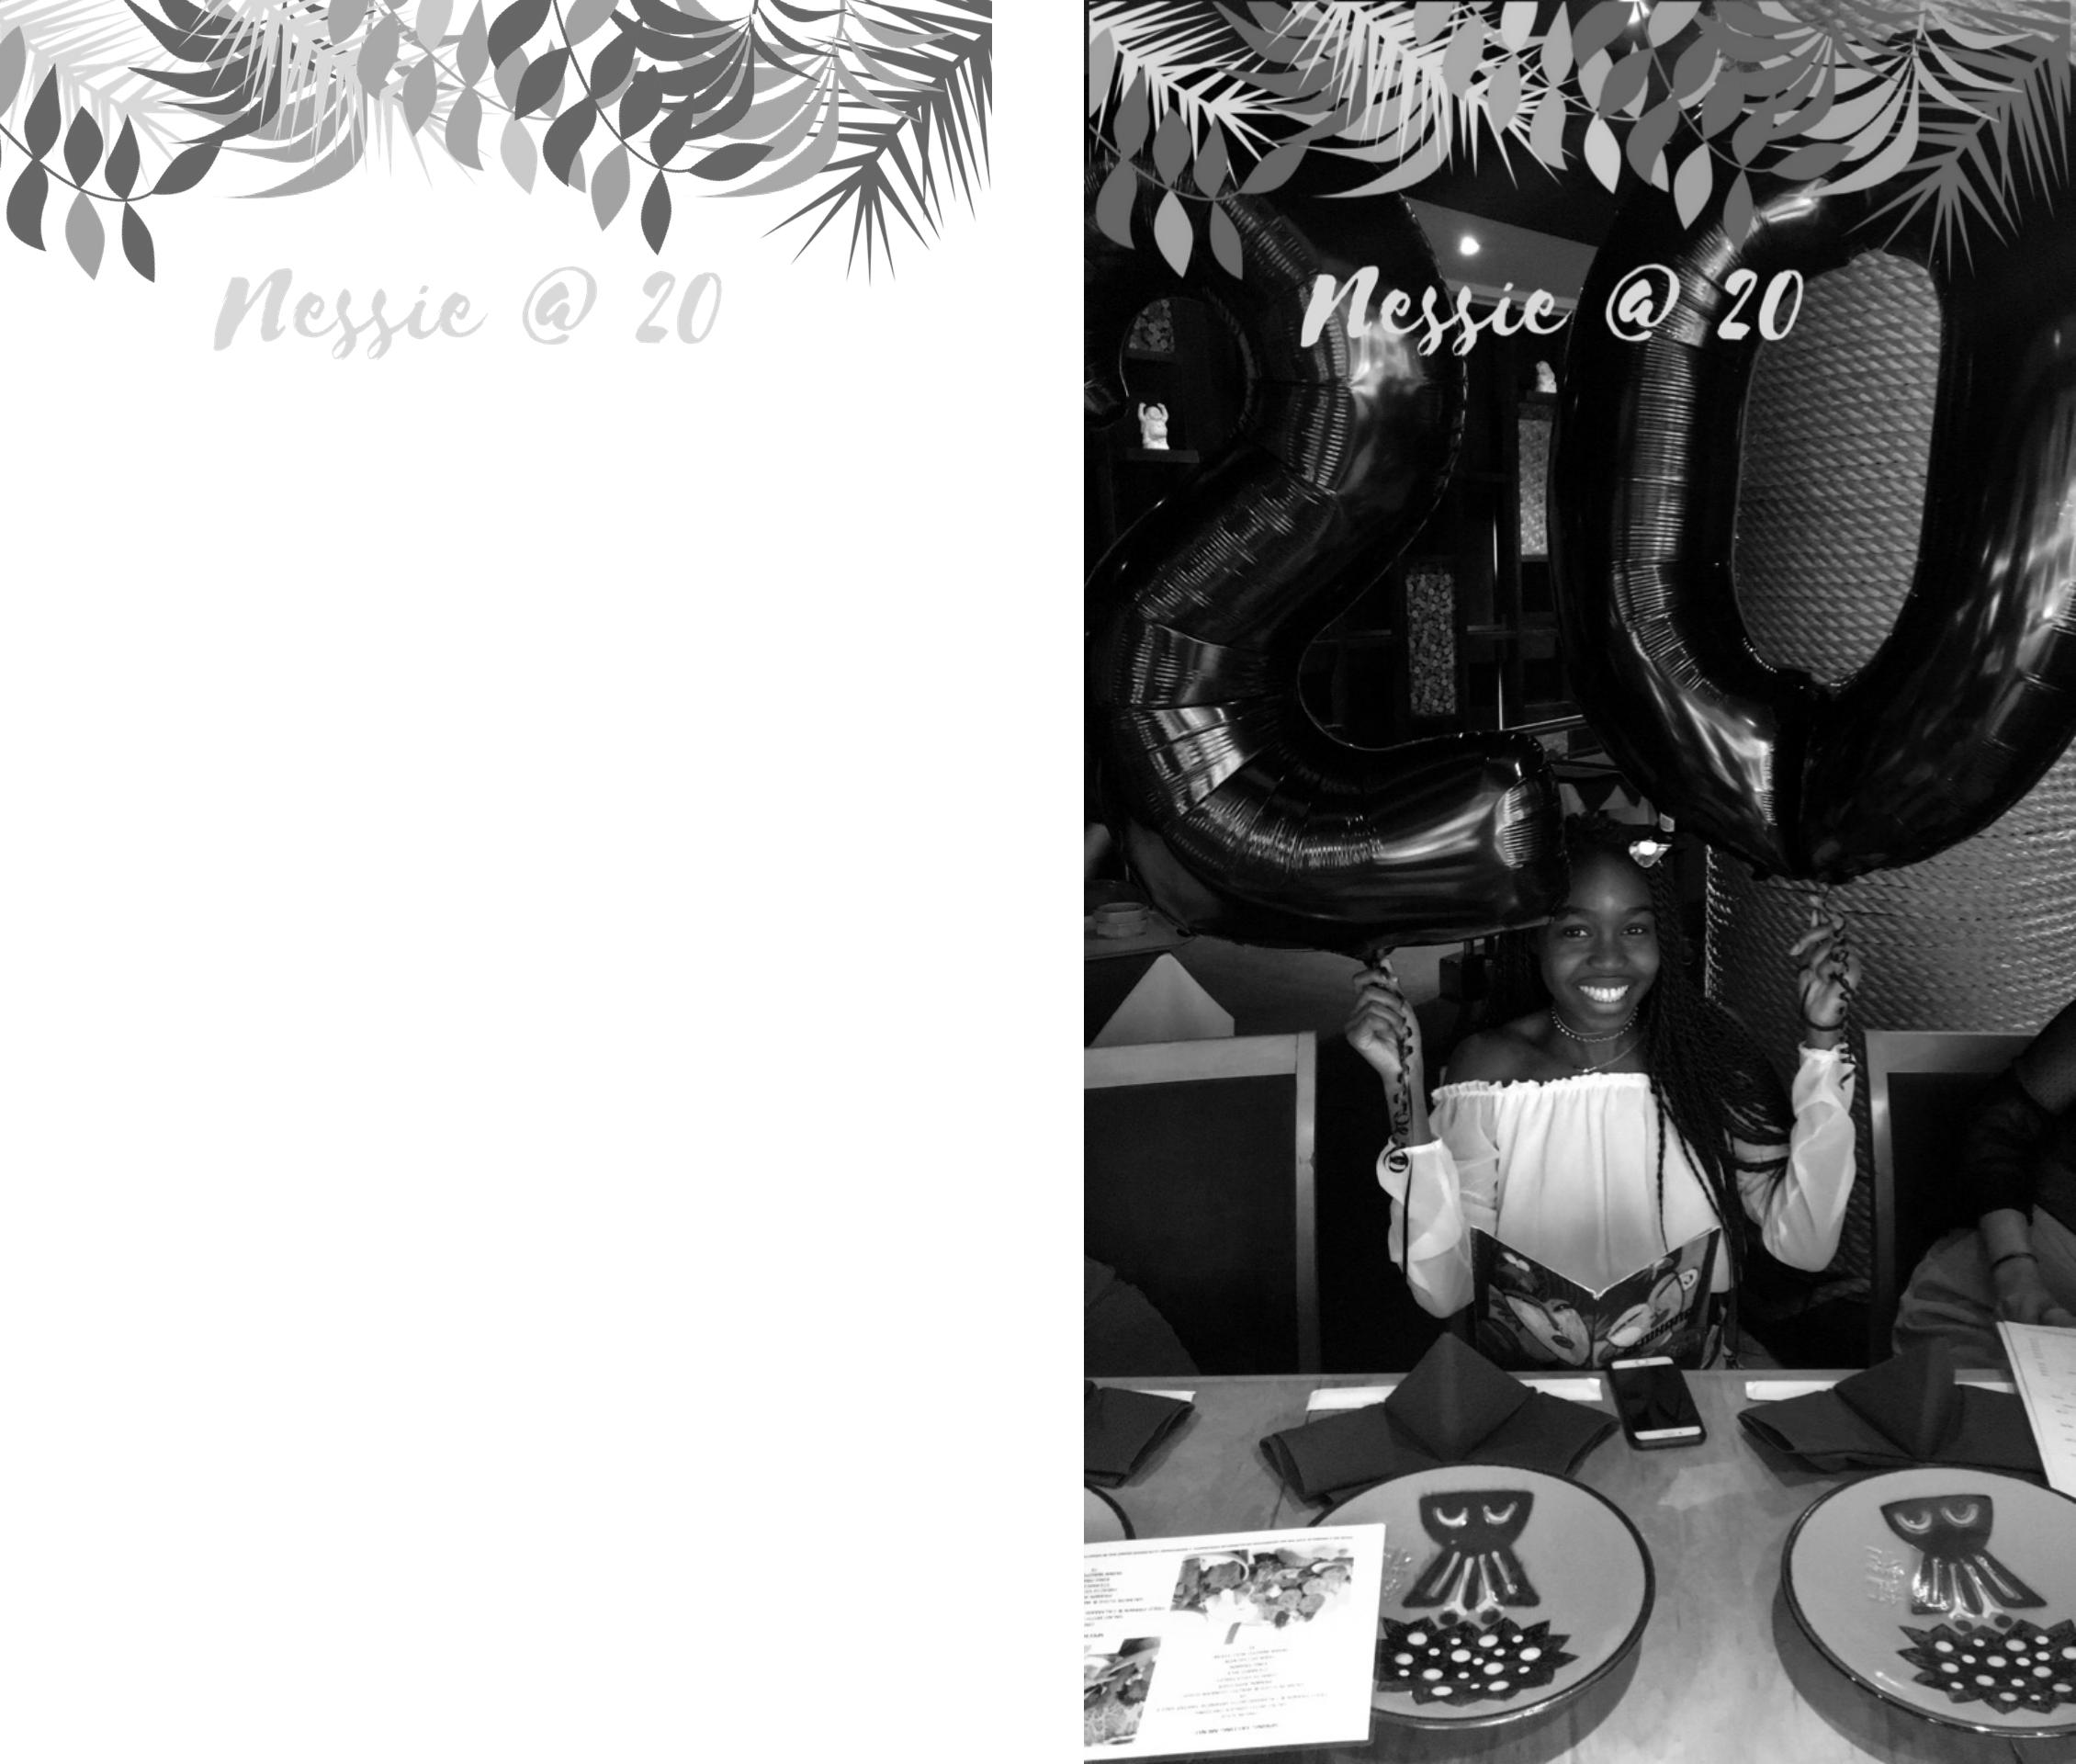 Nessie at 20